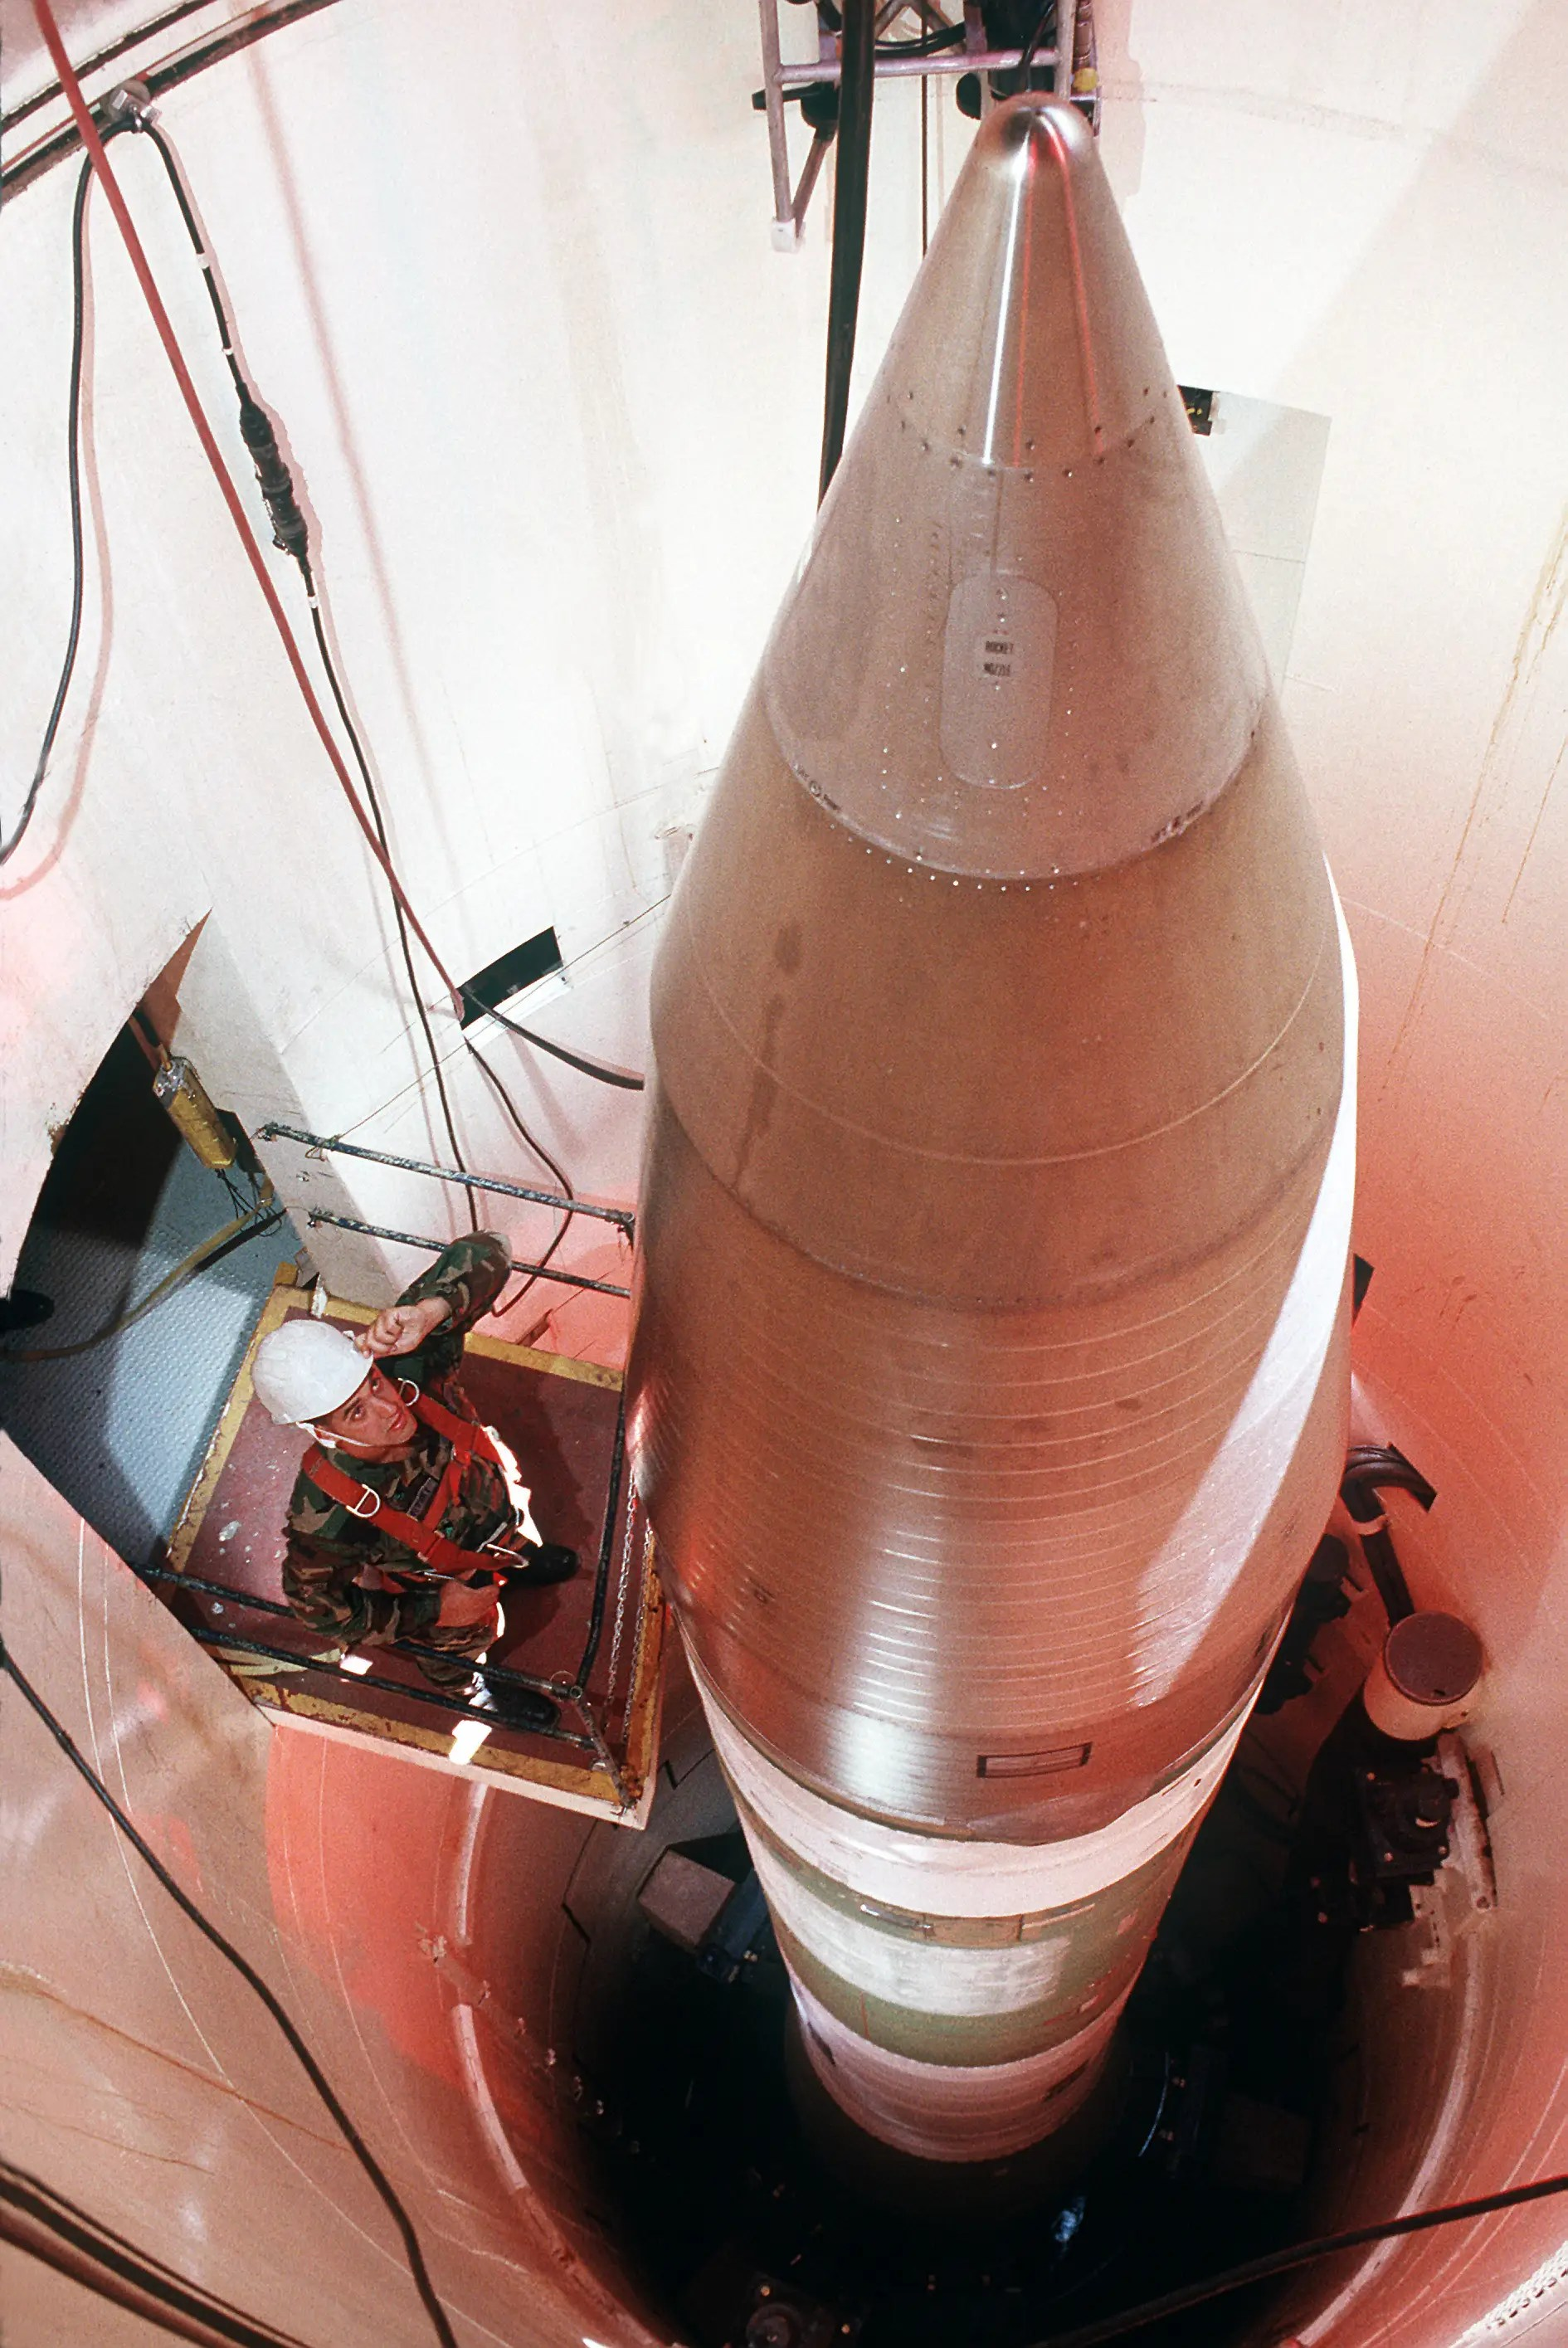 Minuteman III ICBM intercontinental ballistic missile